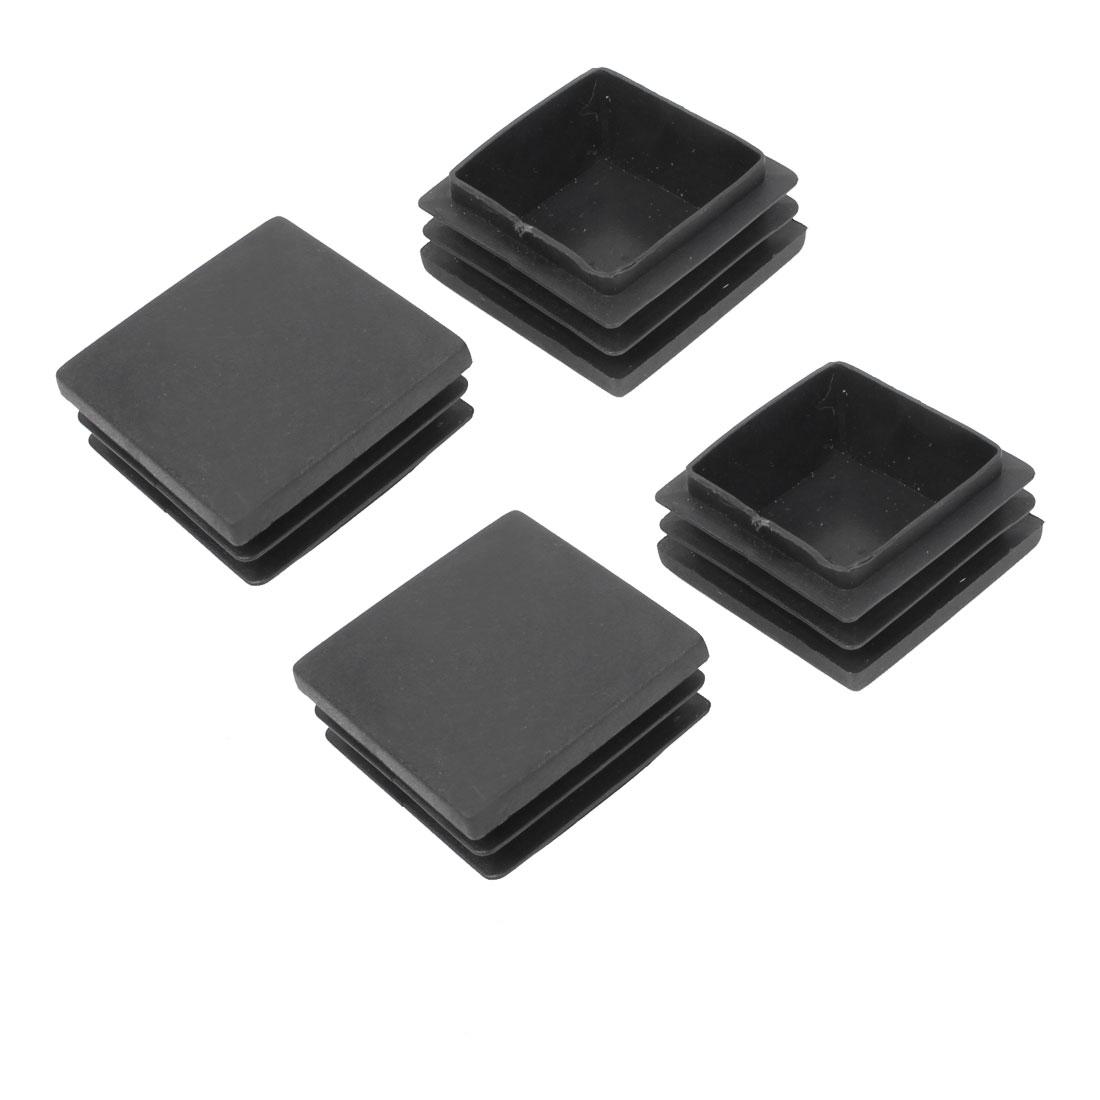 39mm x 39mm Plastic Furniture Tube Inserts End Blanking Caps Black 4 Pcs